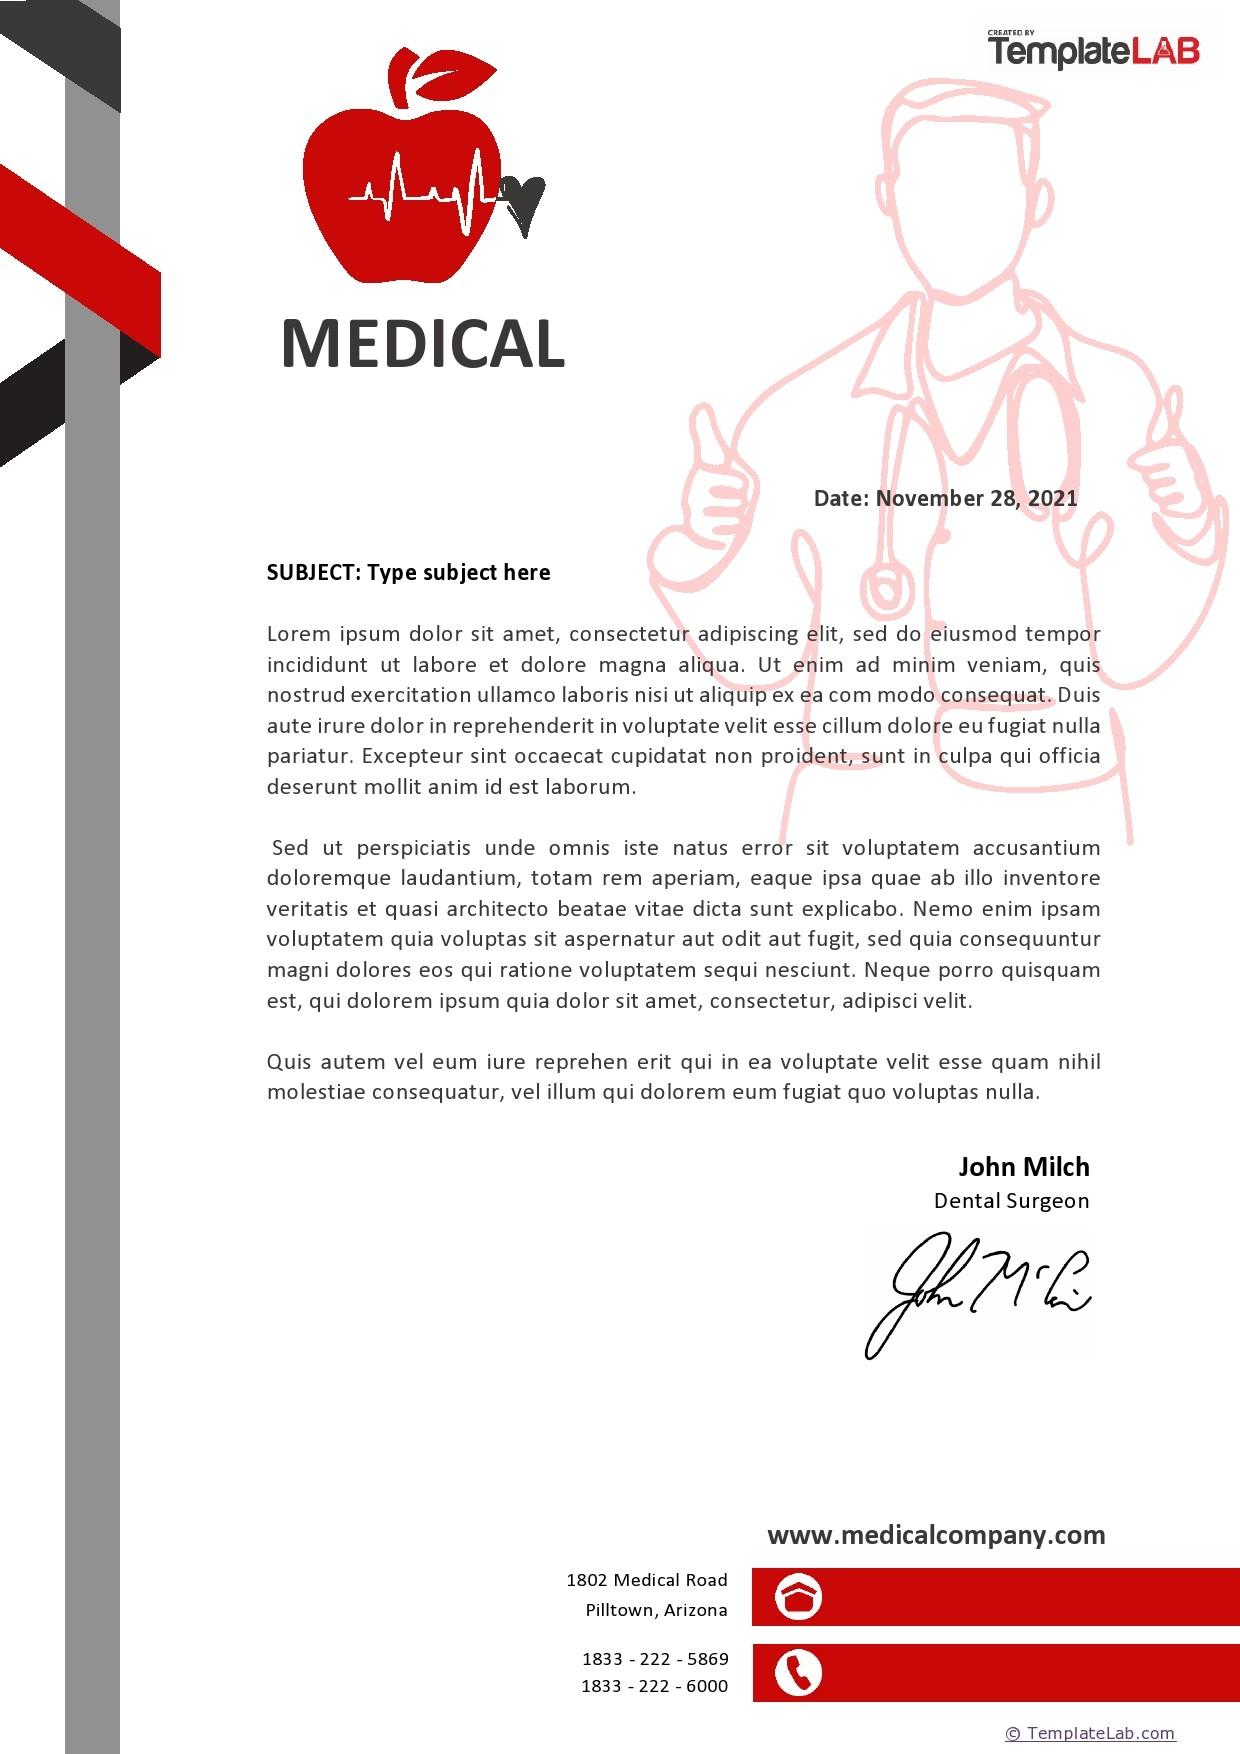 Free Medical Letterhead Template - TemplateLab.com